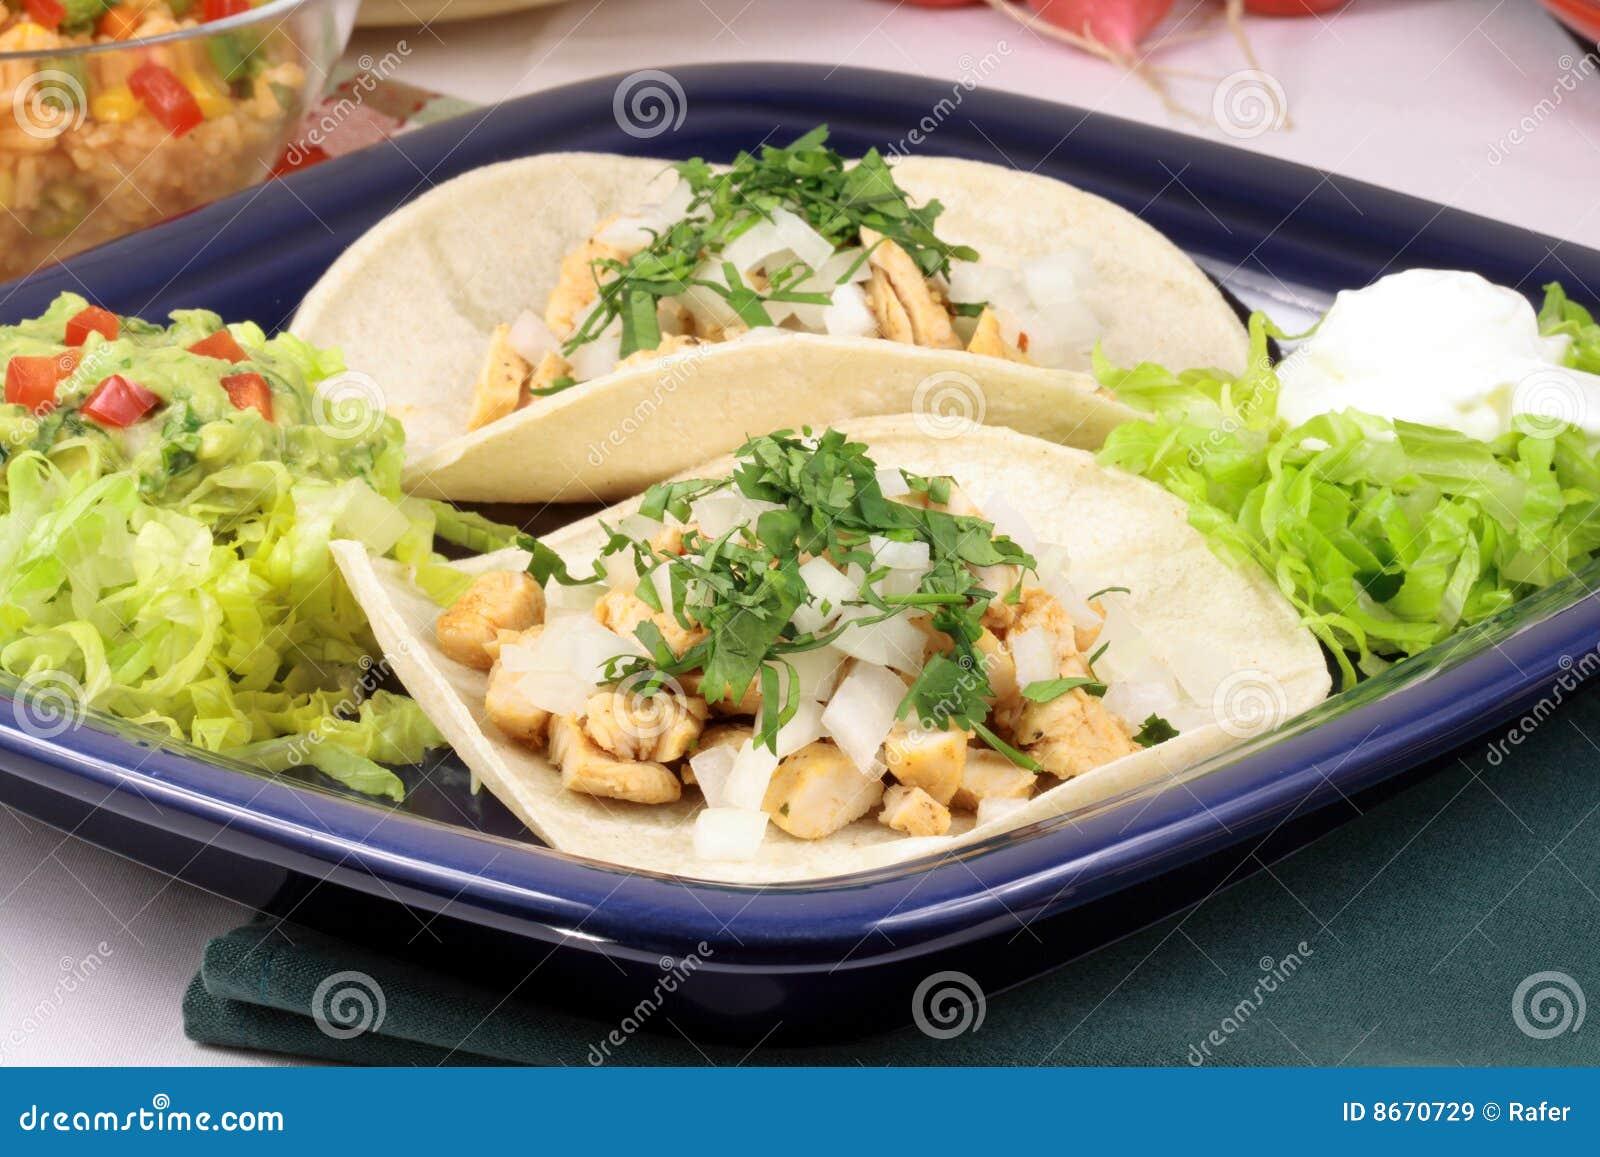 Tacos gastronome fin